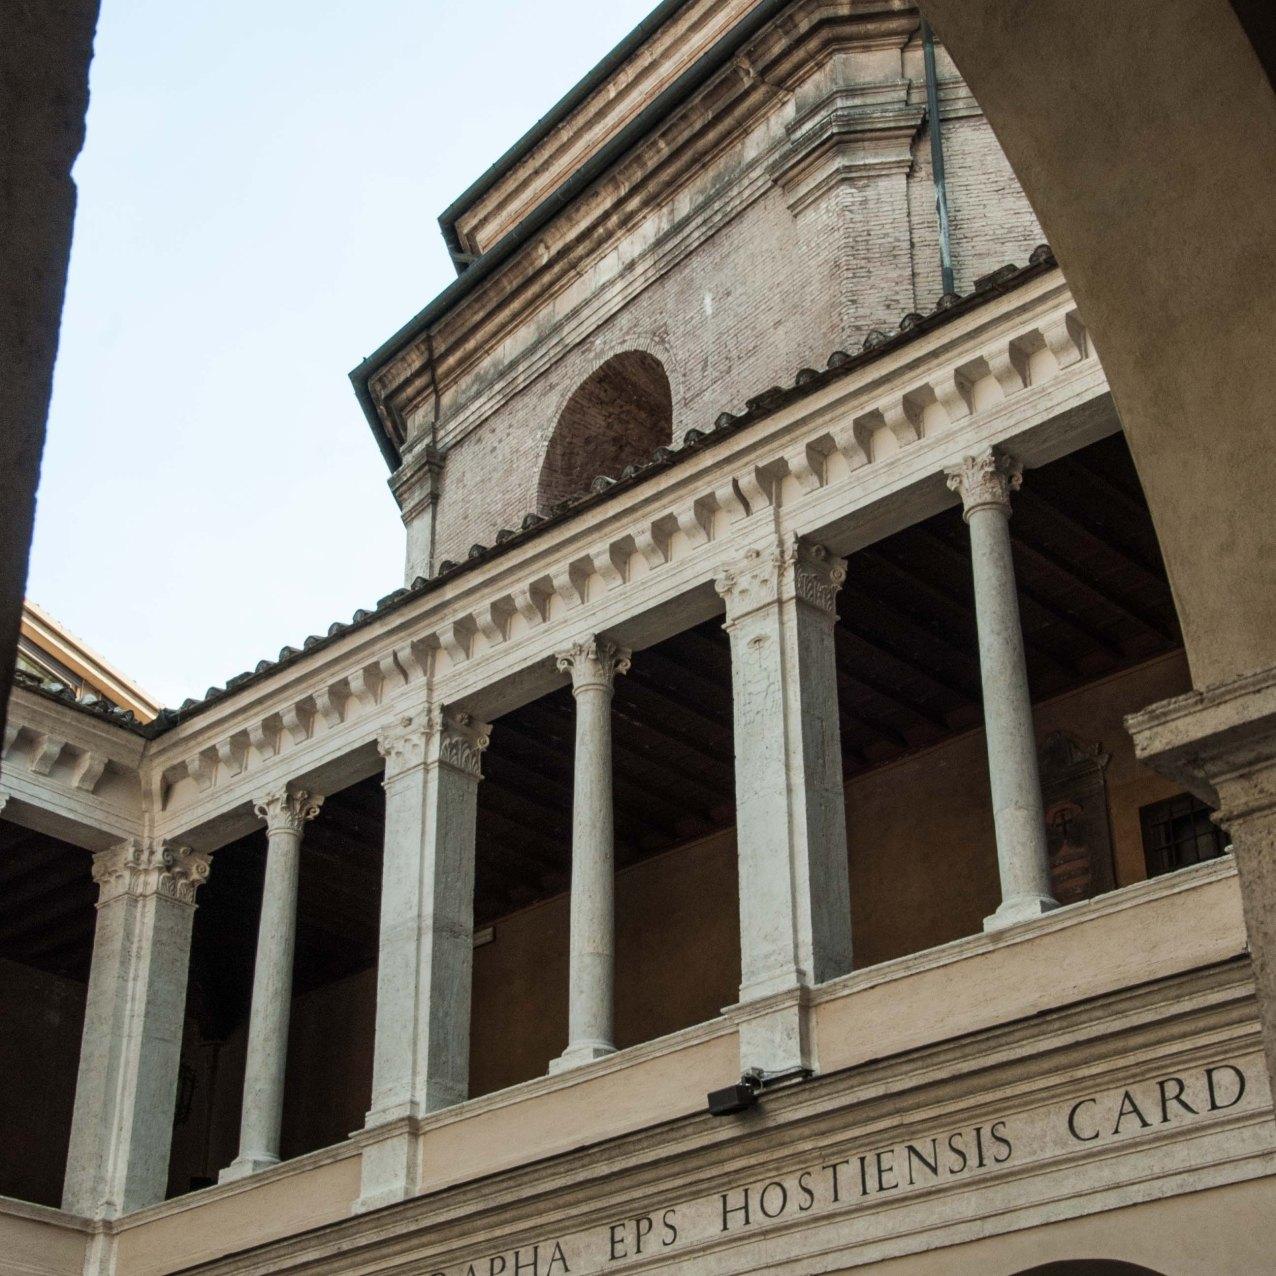 Courtyard of the Chiostro del Bramante